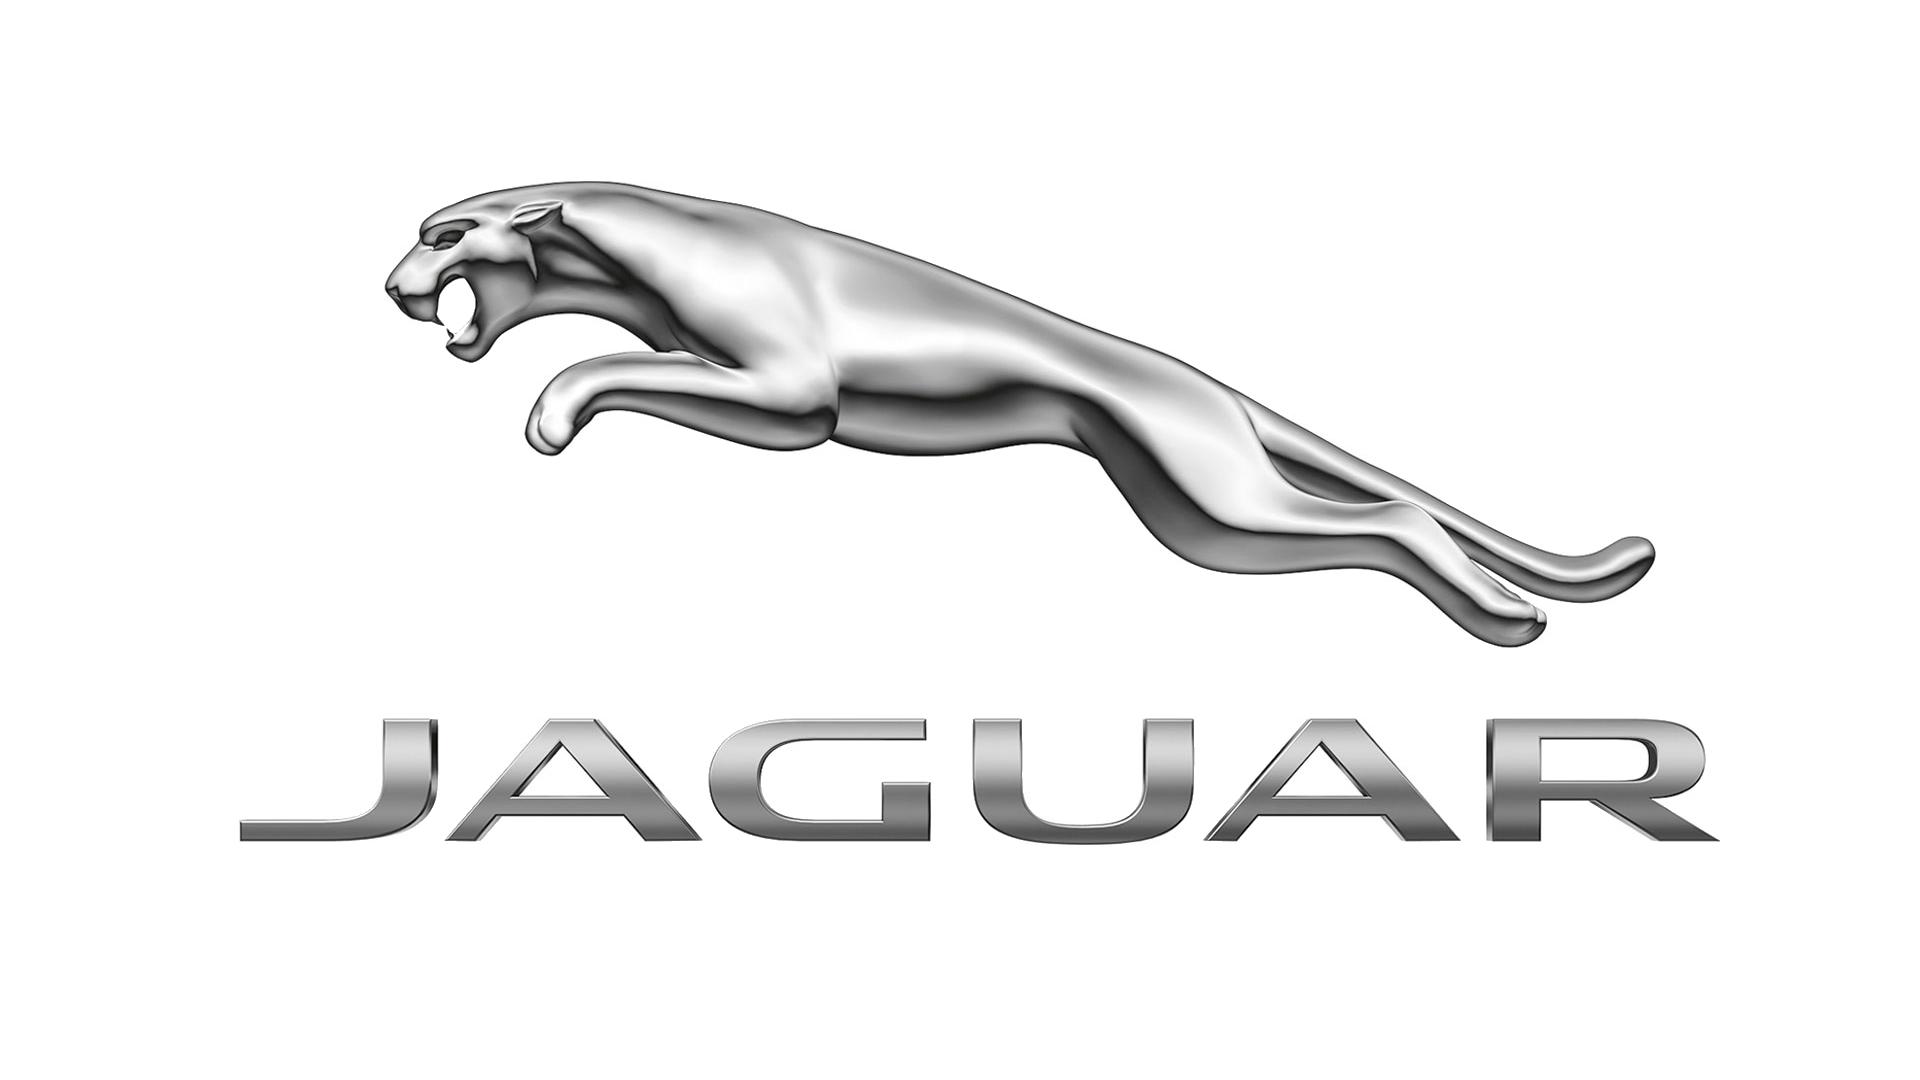 Télephone information entreprise  Jaguar